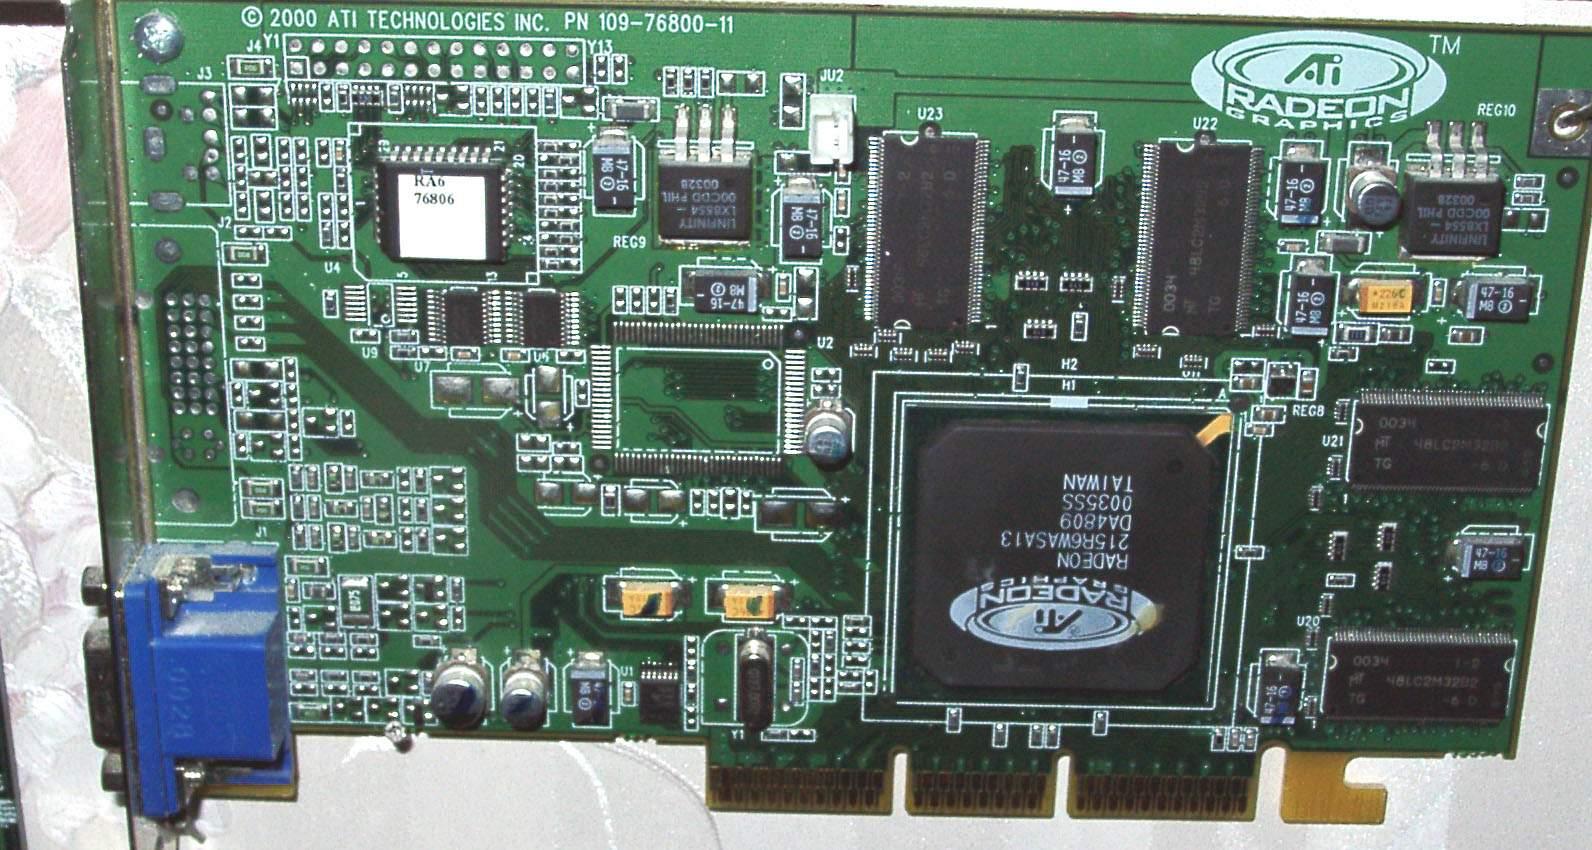 Краткая ретроспектива 3D-ускорителей в трех тестах: http://www.ixbt.com/video2/retro2003.shtml